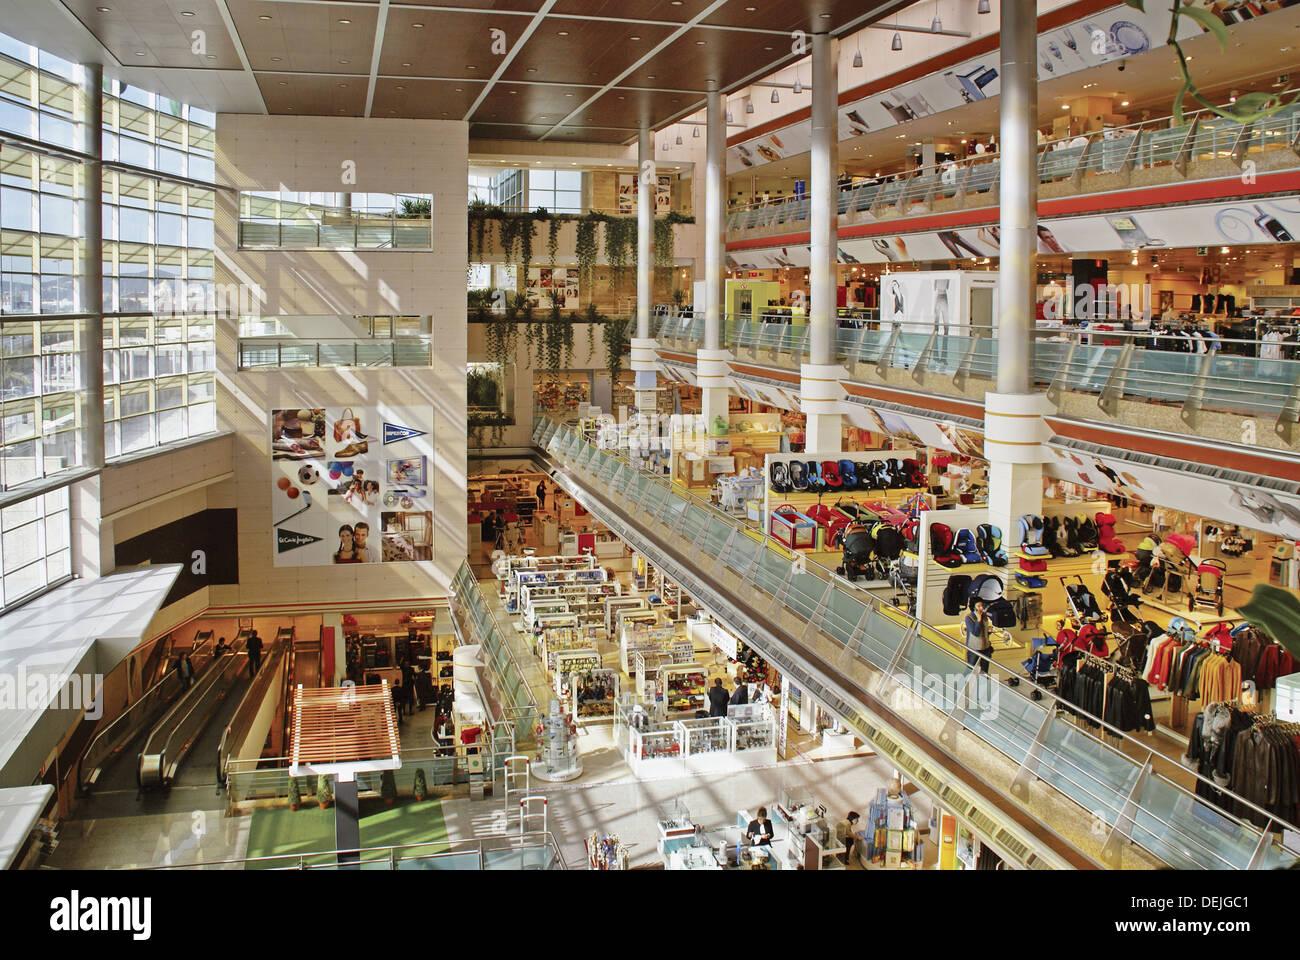 Spain malaga el corte ingles department store at mijas costa stock photo royalty free - El corte ingles stores ...